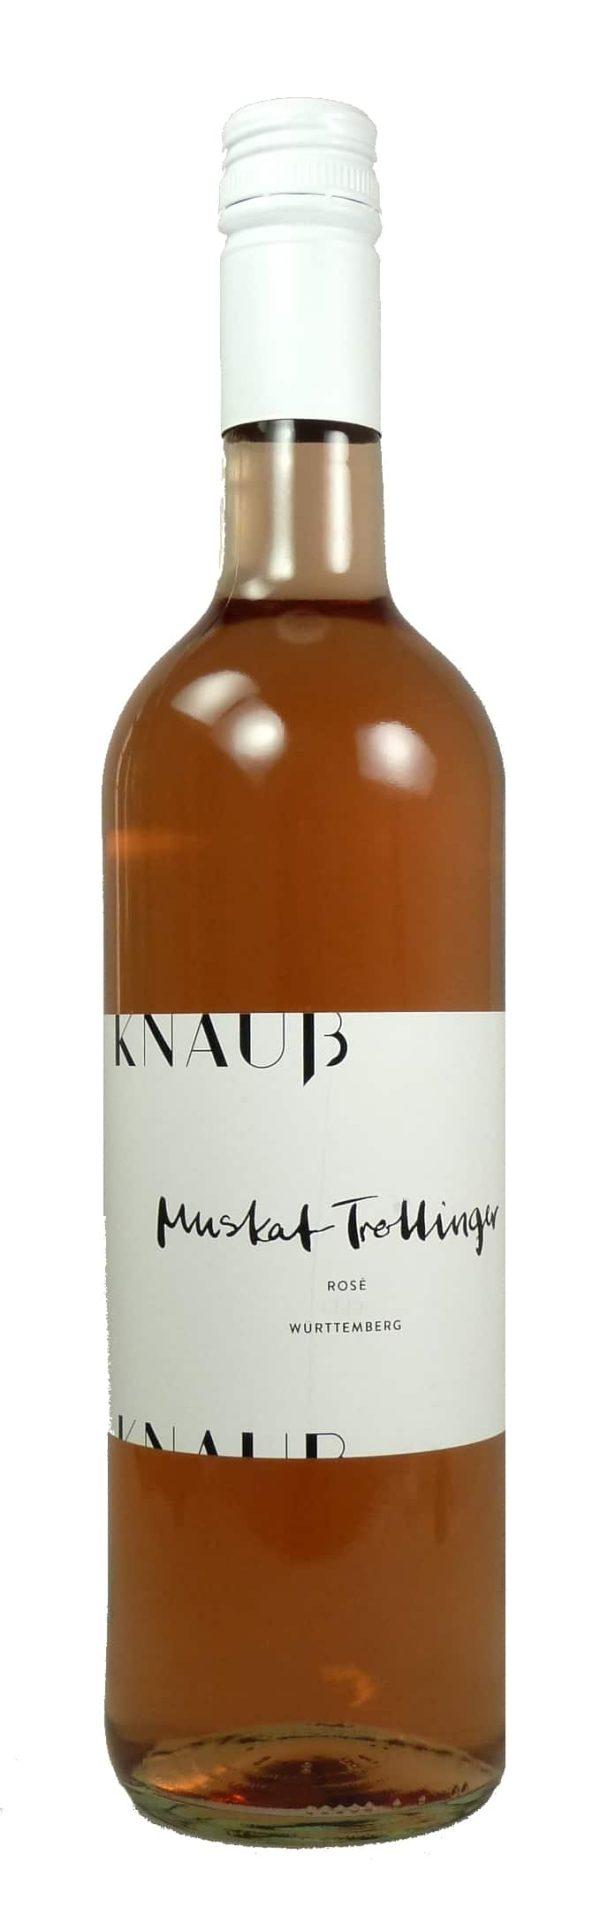 Muskattrollinger Rosé Qualitätswein 2017